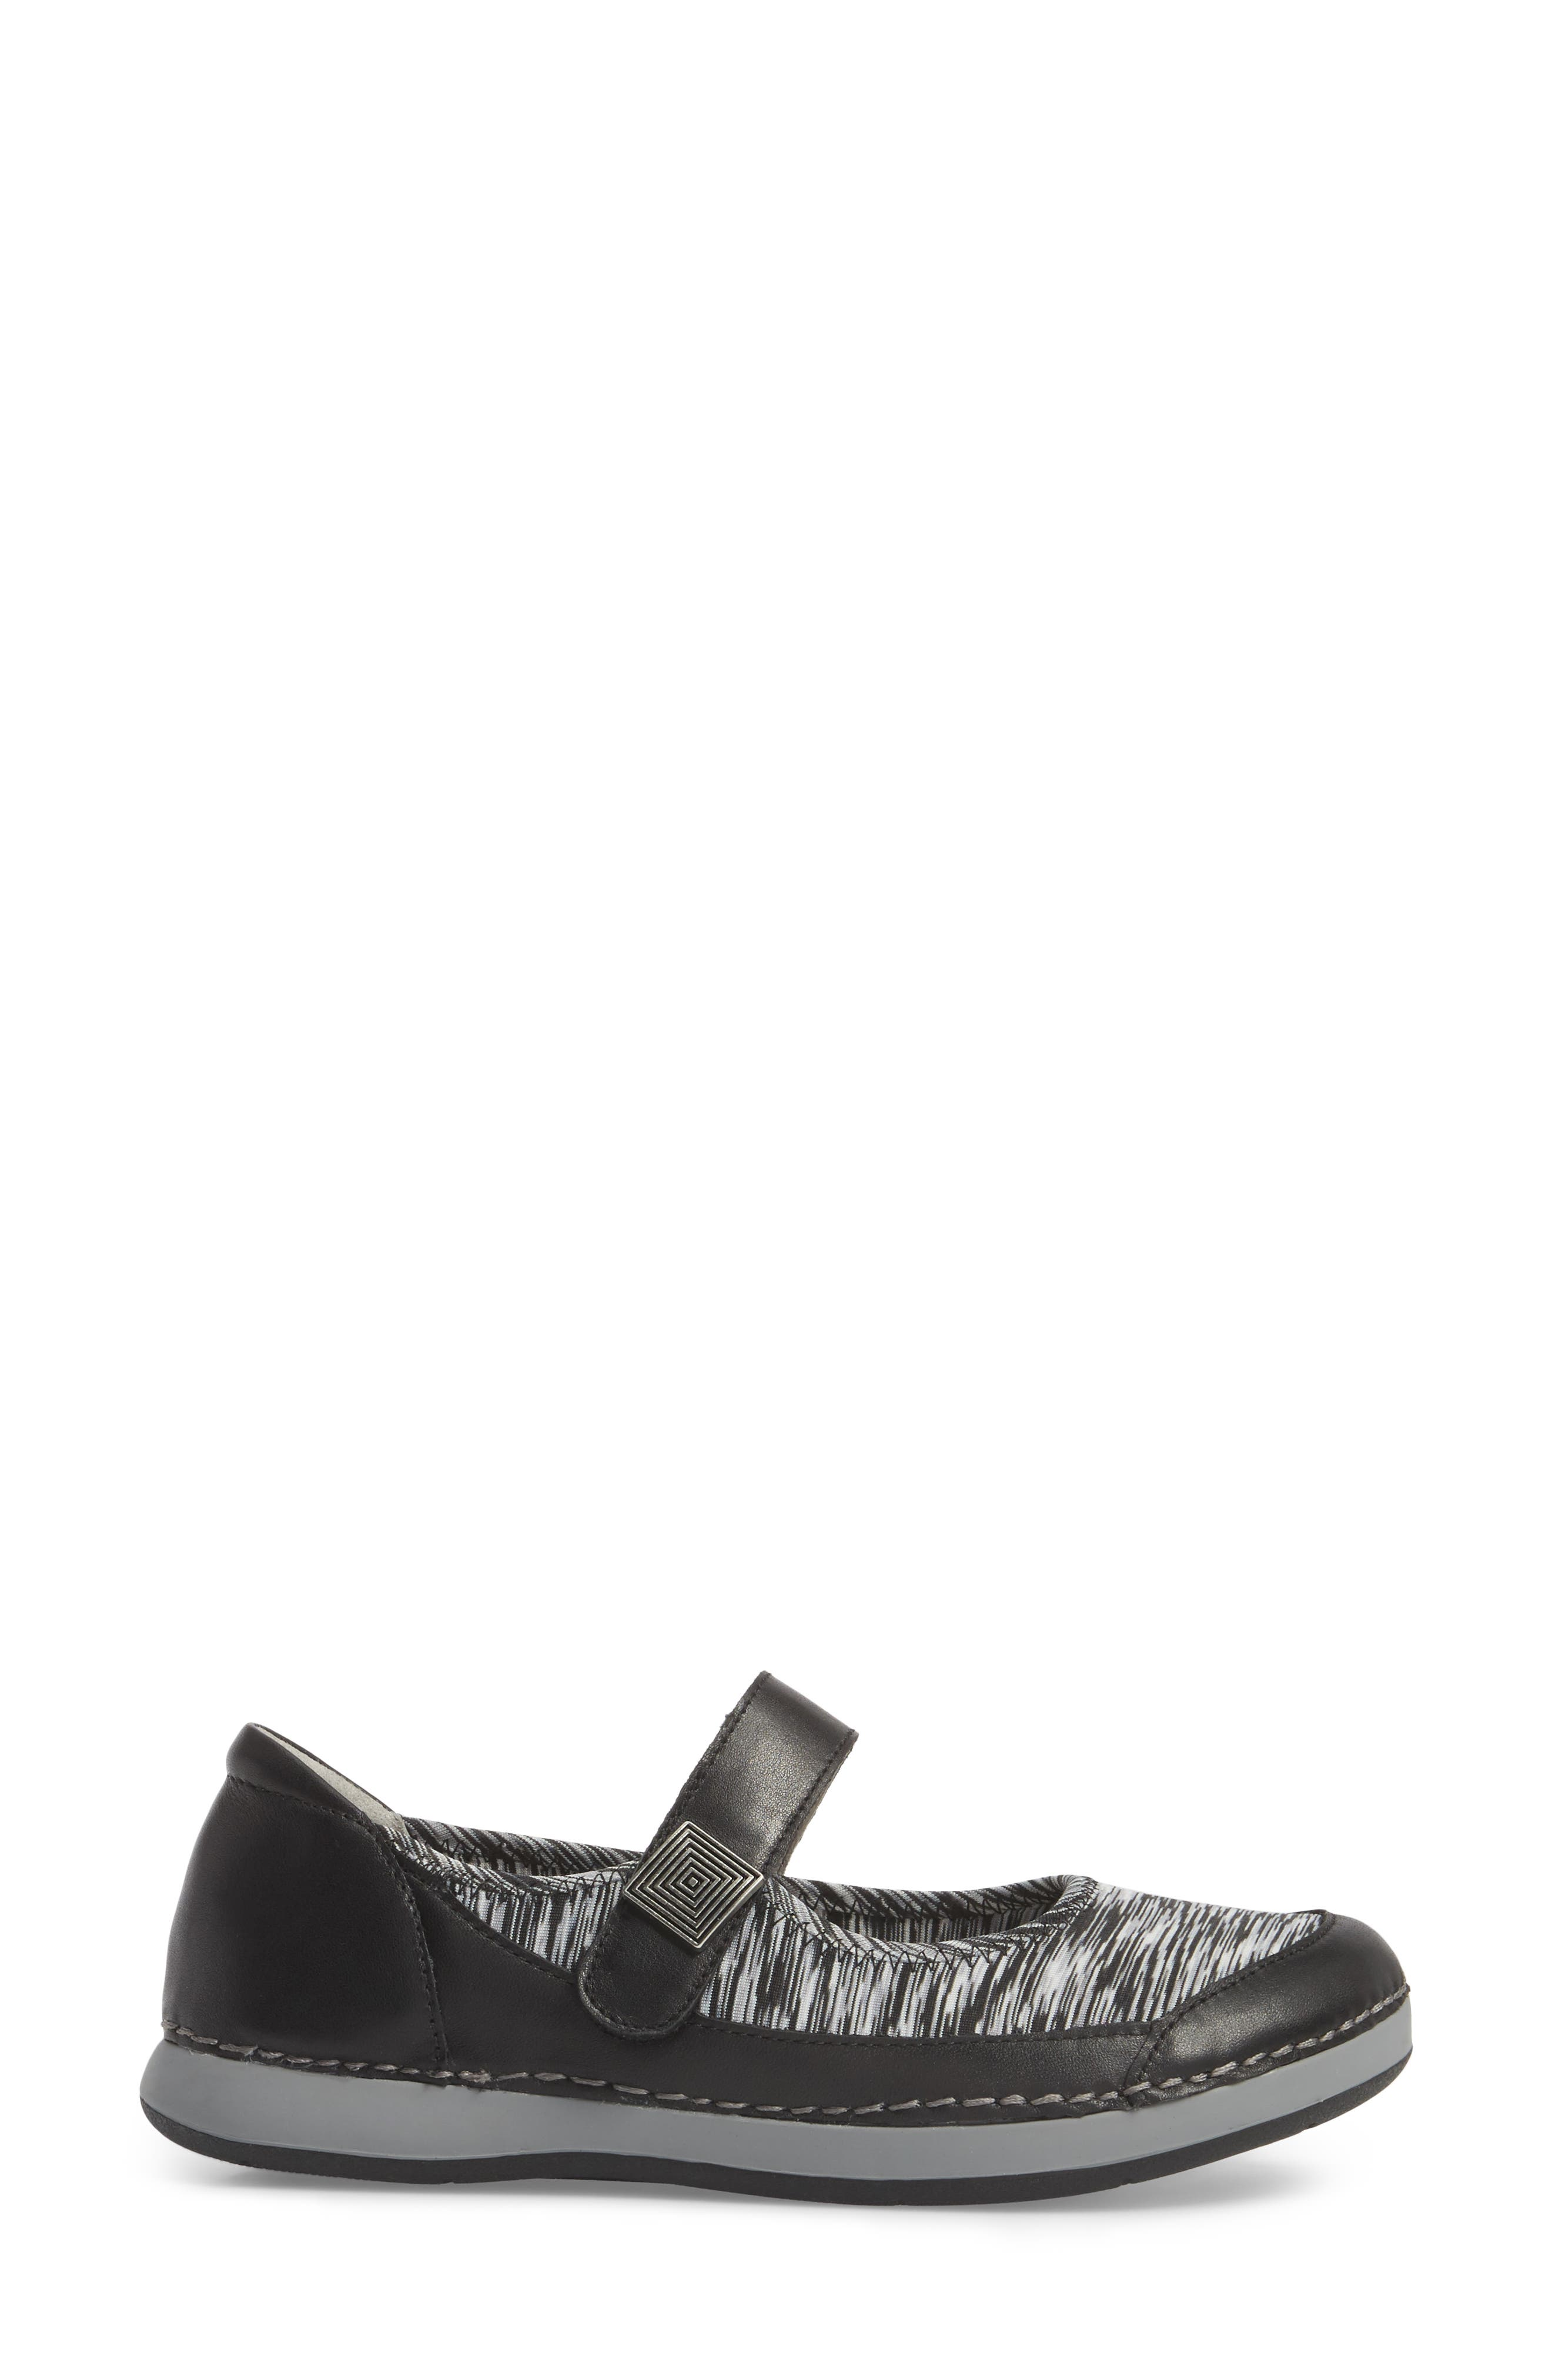 Gem Mary Jane Flat,                             Alternate thumbnail 3, color,                             Black Leather